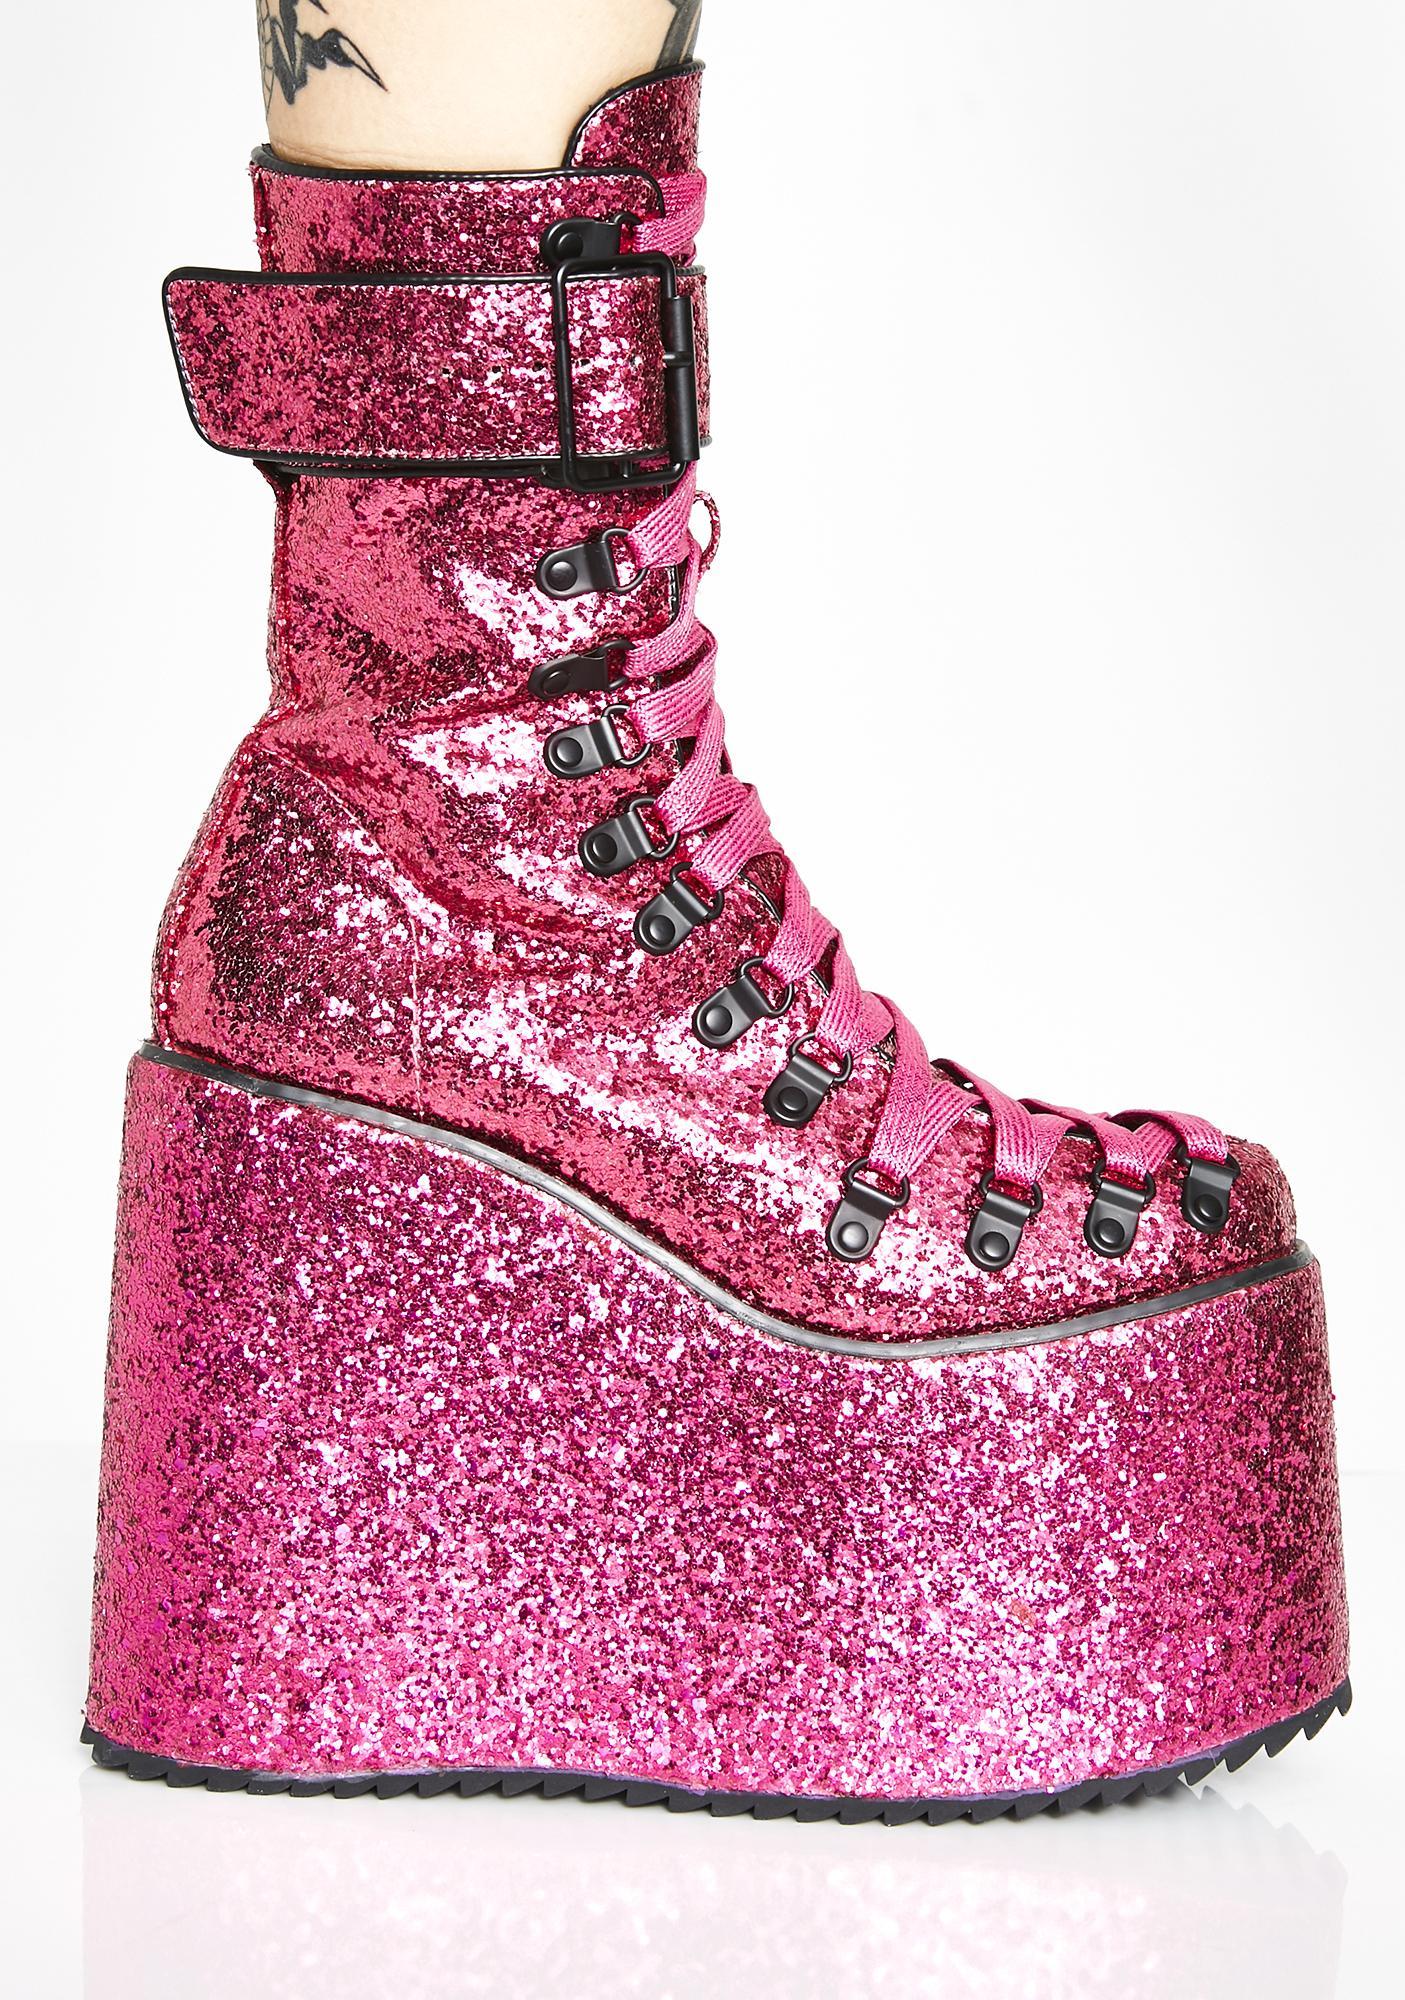 Club Exx Sugar Coated Traitor Boots